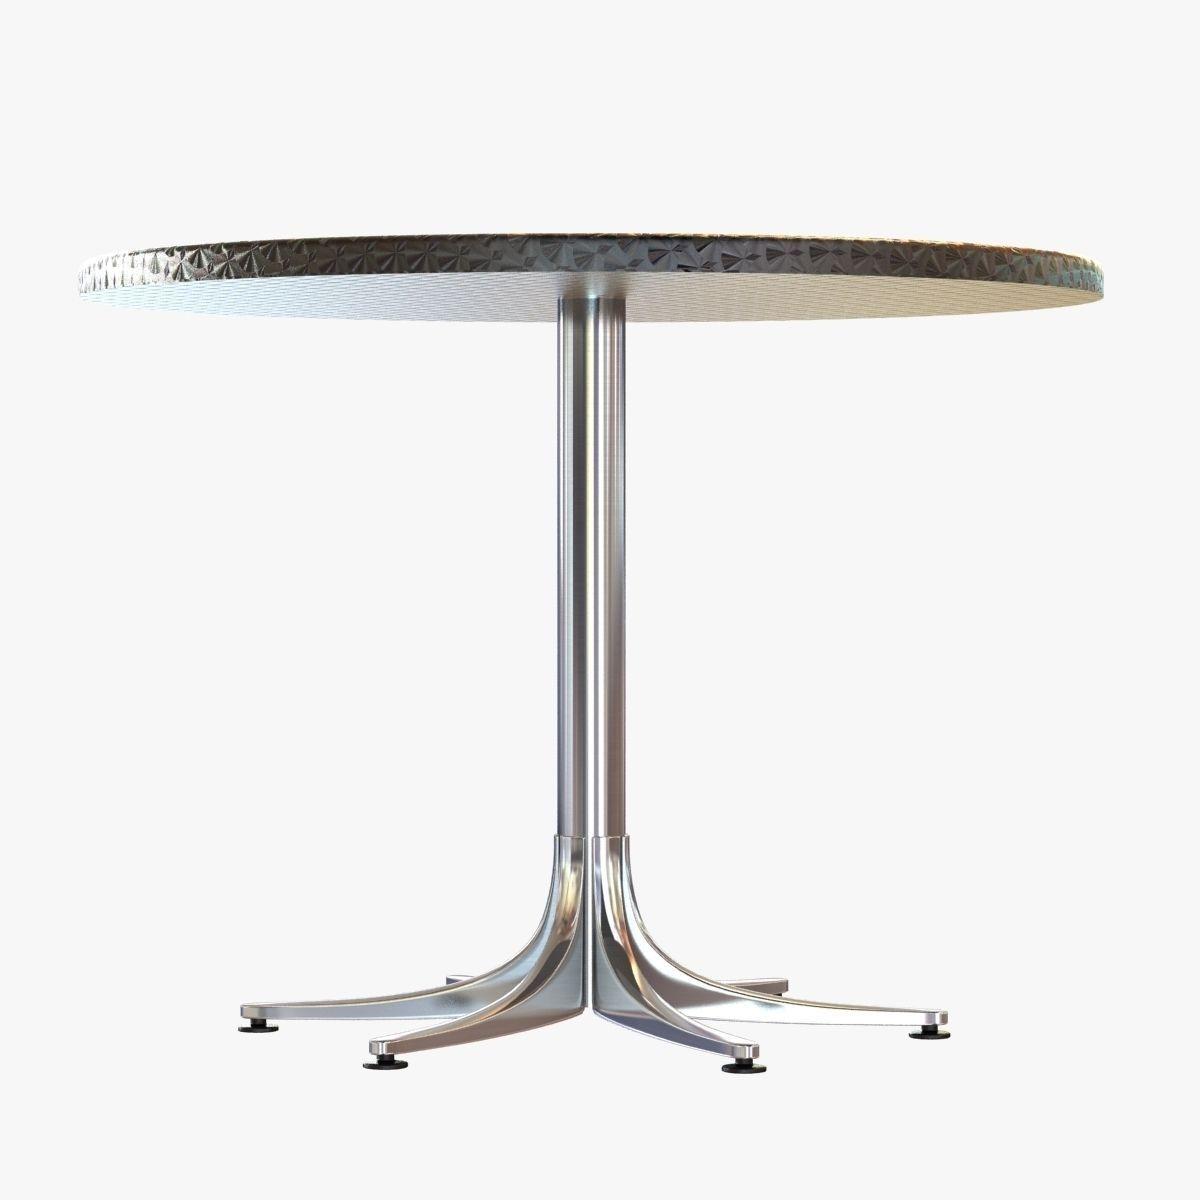 ... Dwr Inox Table Large Round 3d Model Max Obj 3ds Fbx Mtl 2 ...